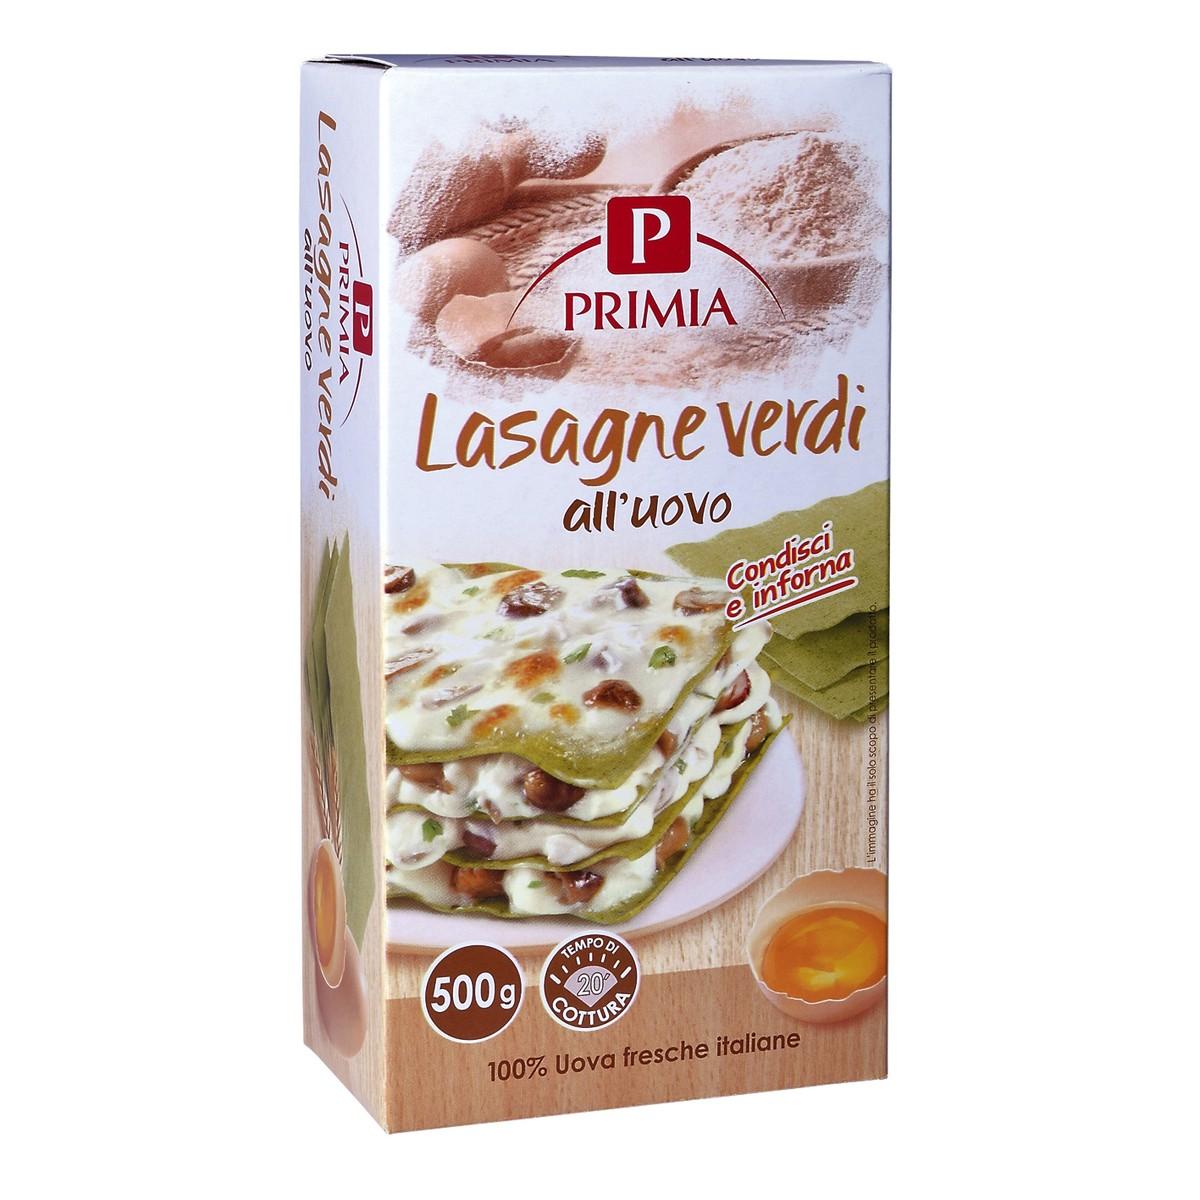 PRIMIA Lasagne verdi all'uovo